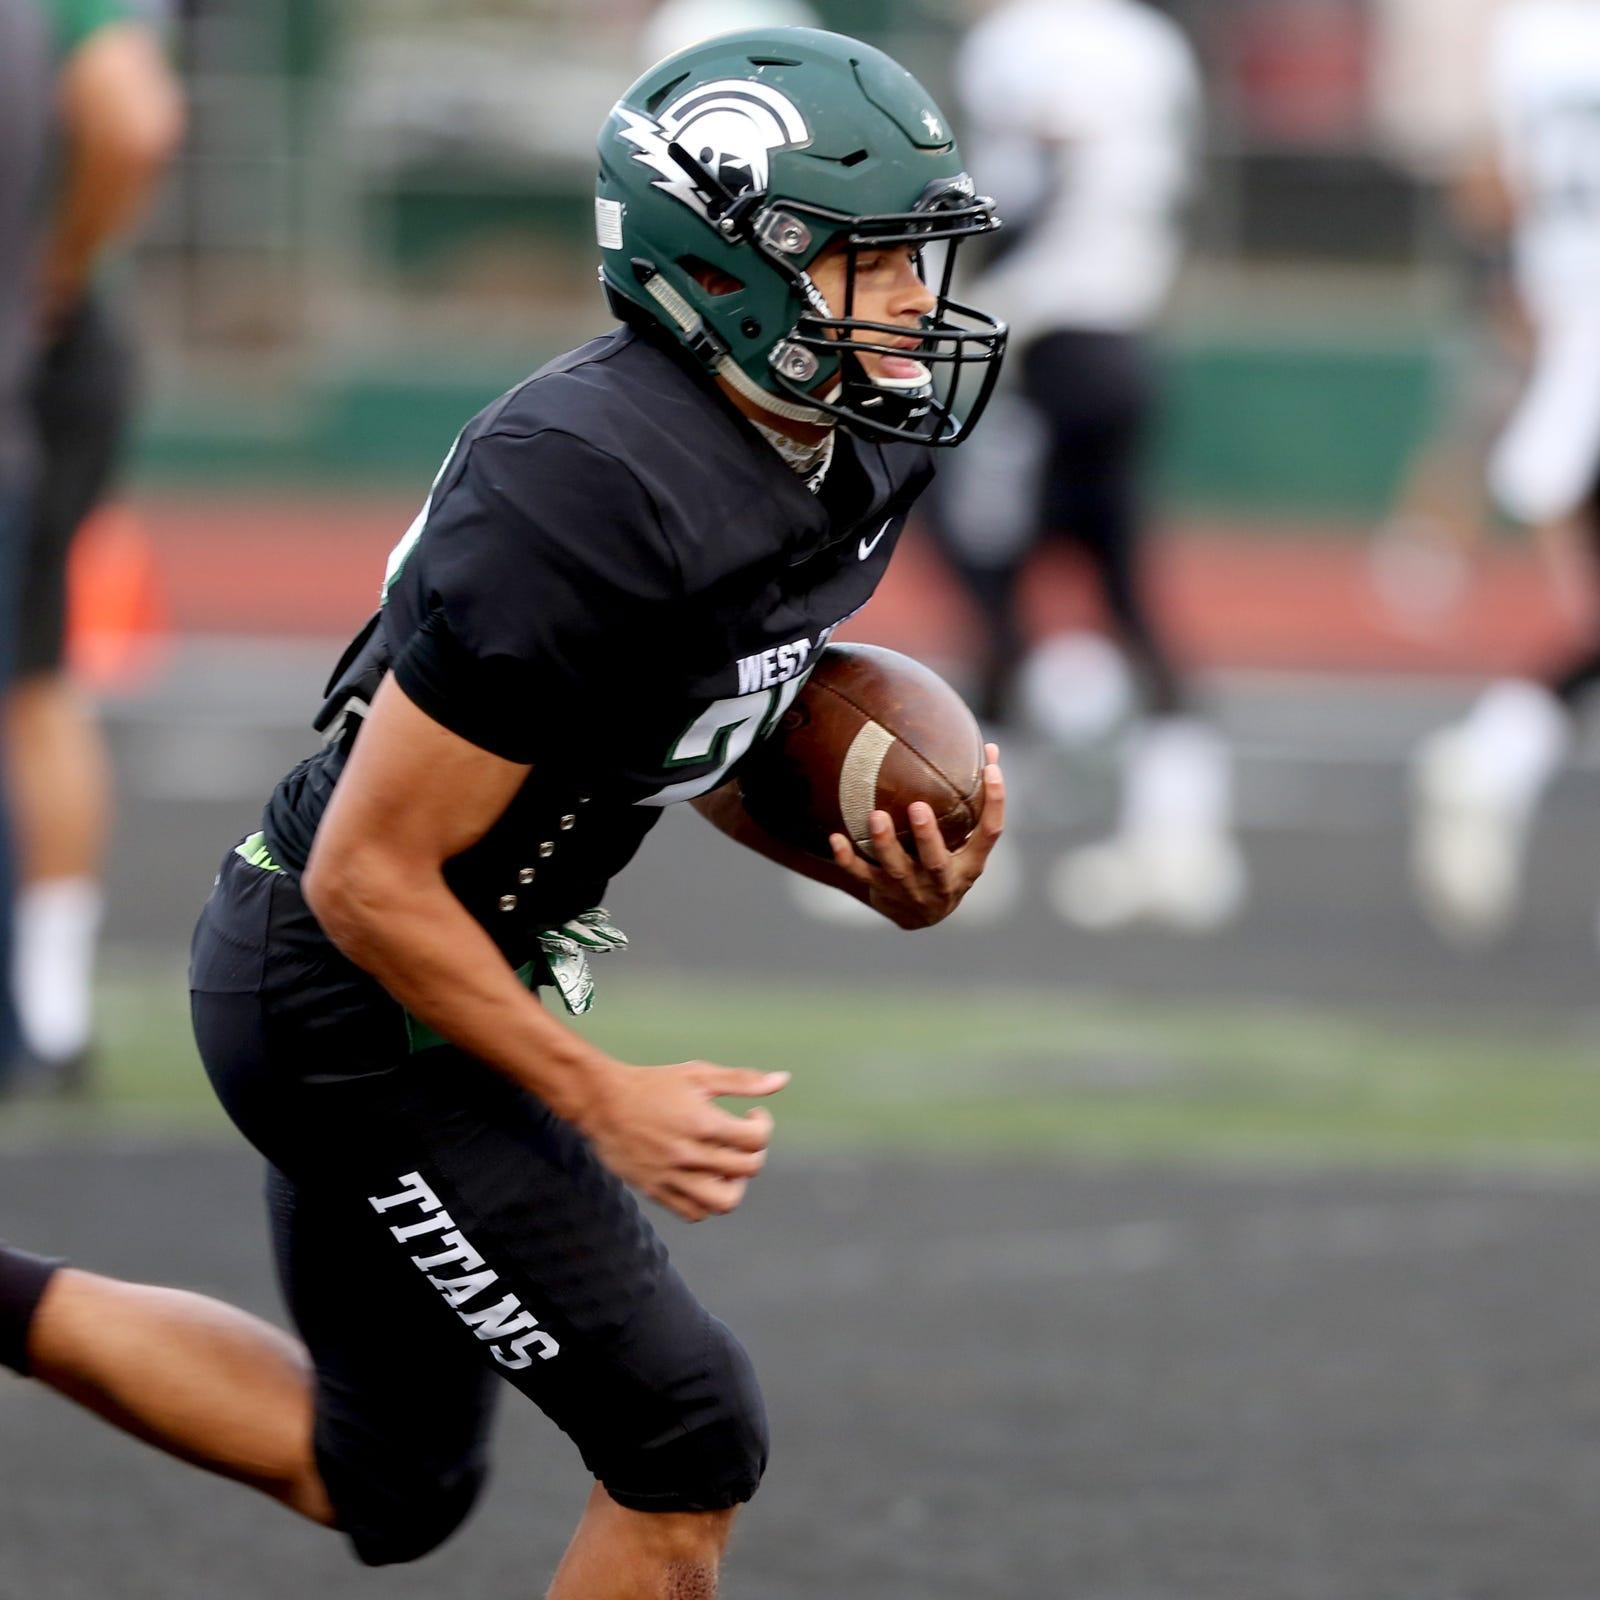 West Salem football loses big to Sheldon